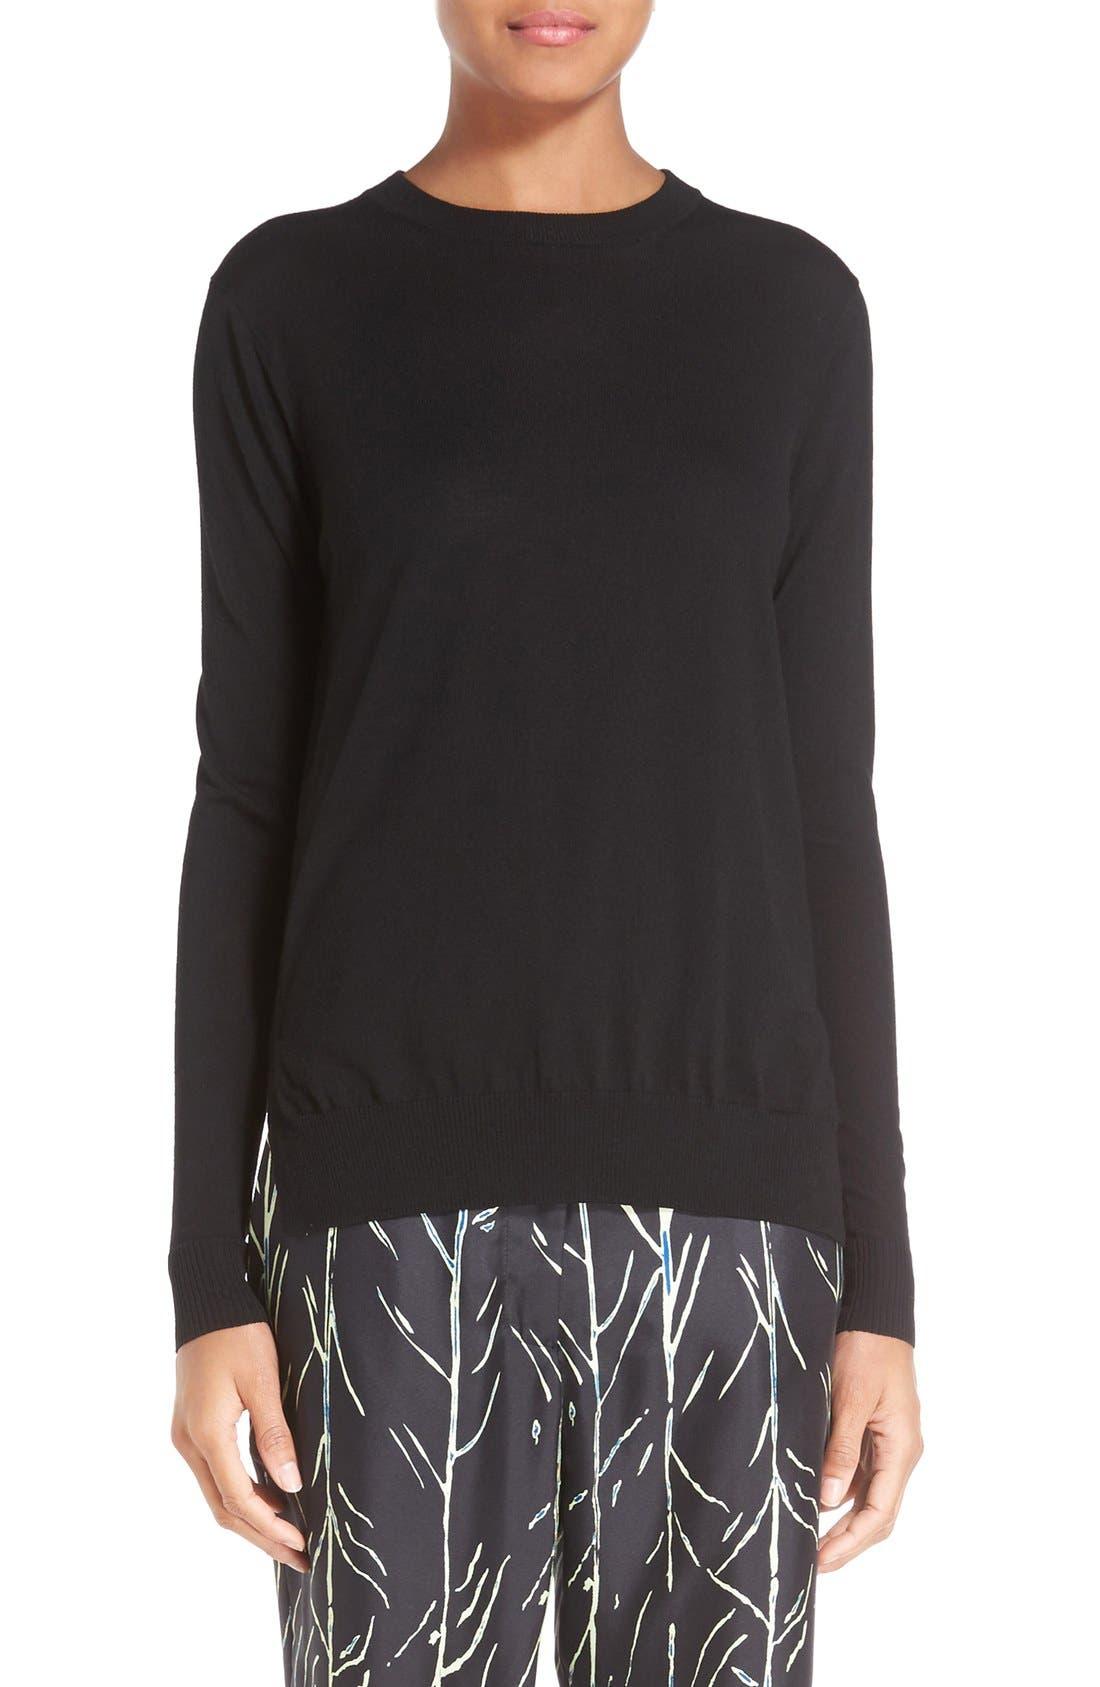 Superfine Merino Wool Sweater,                         Main,                         color, Black